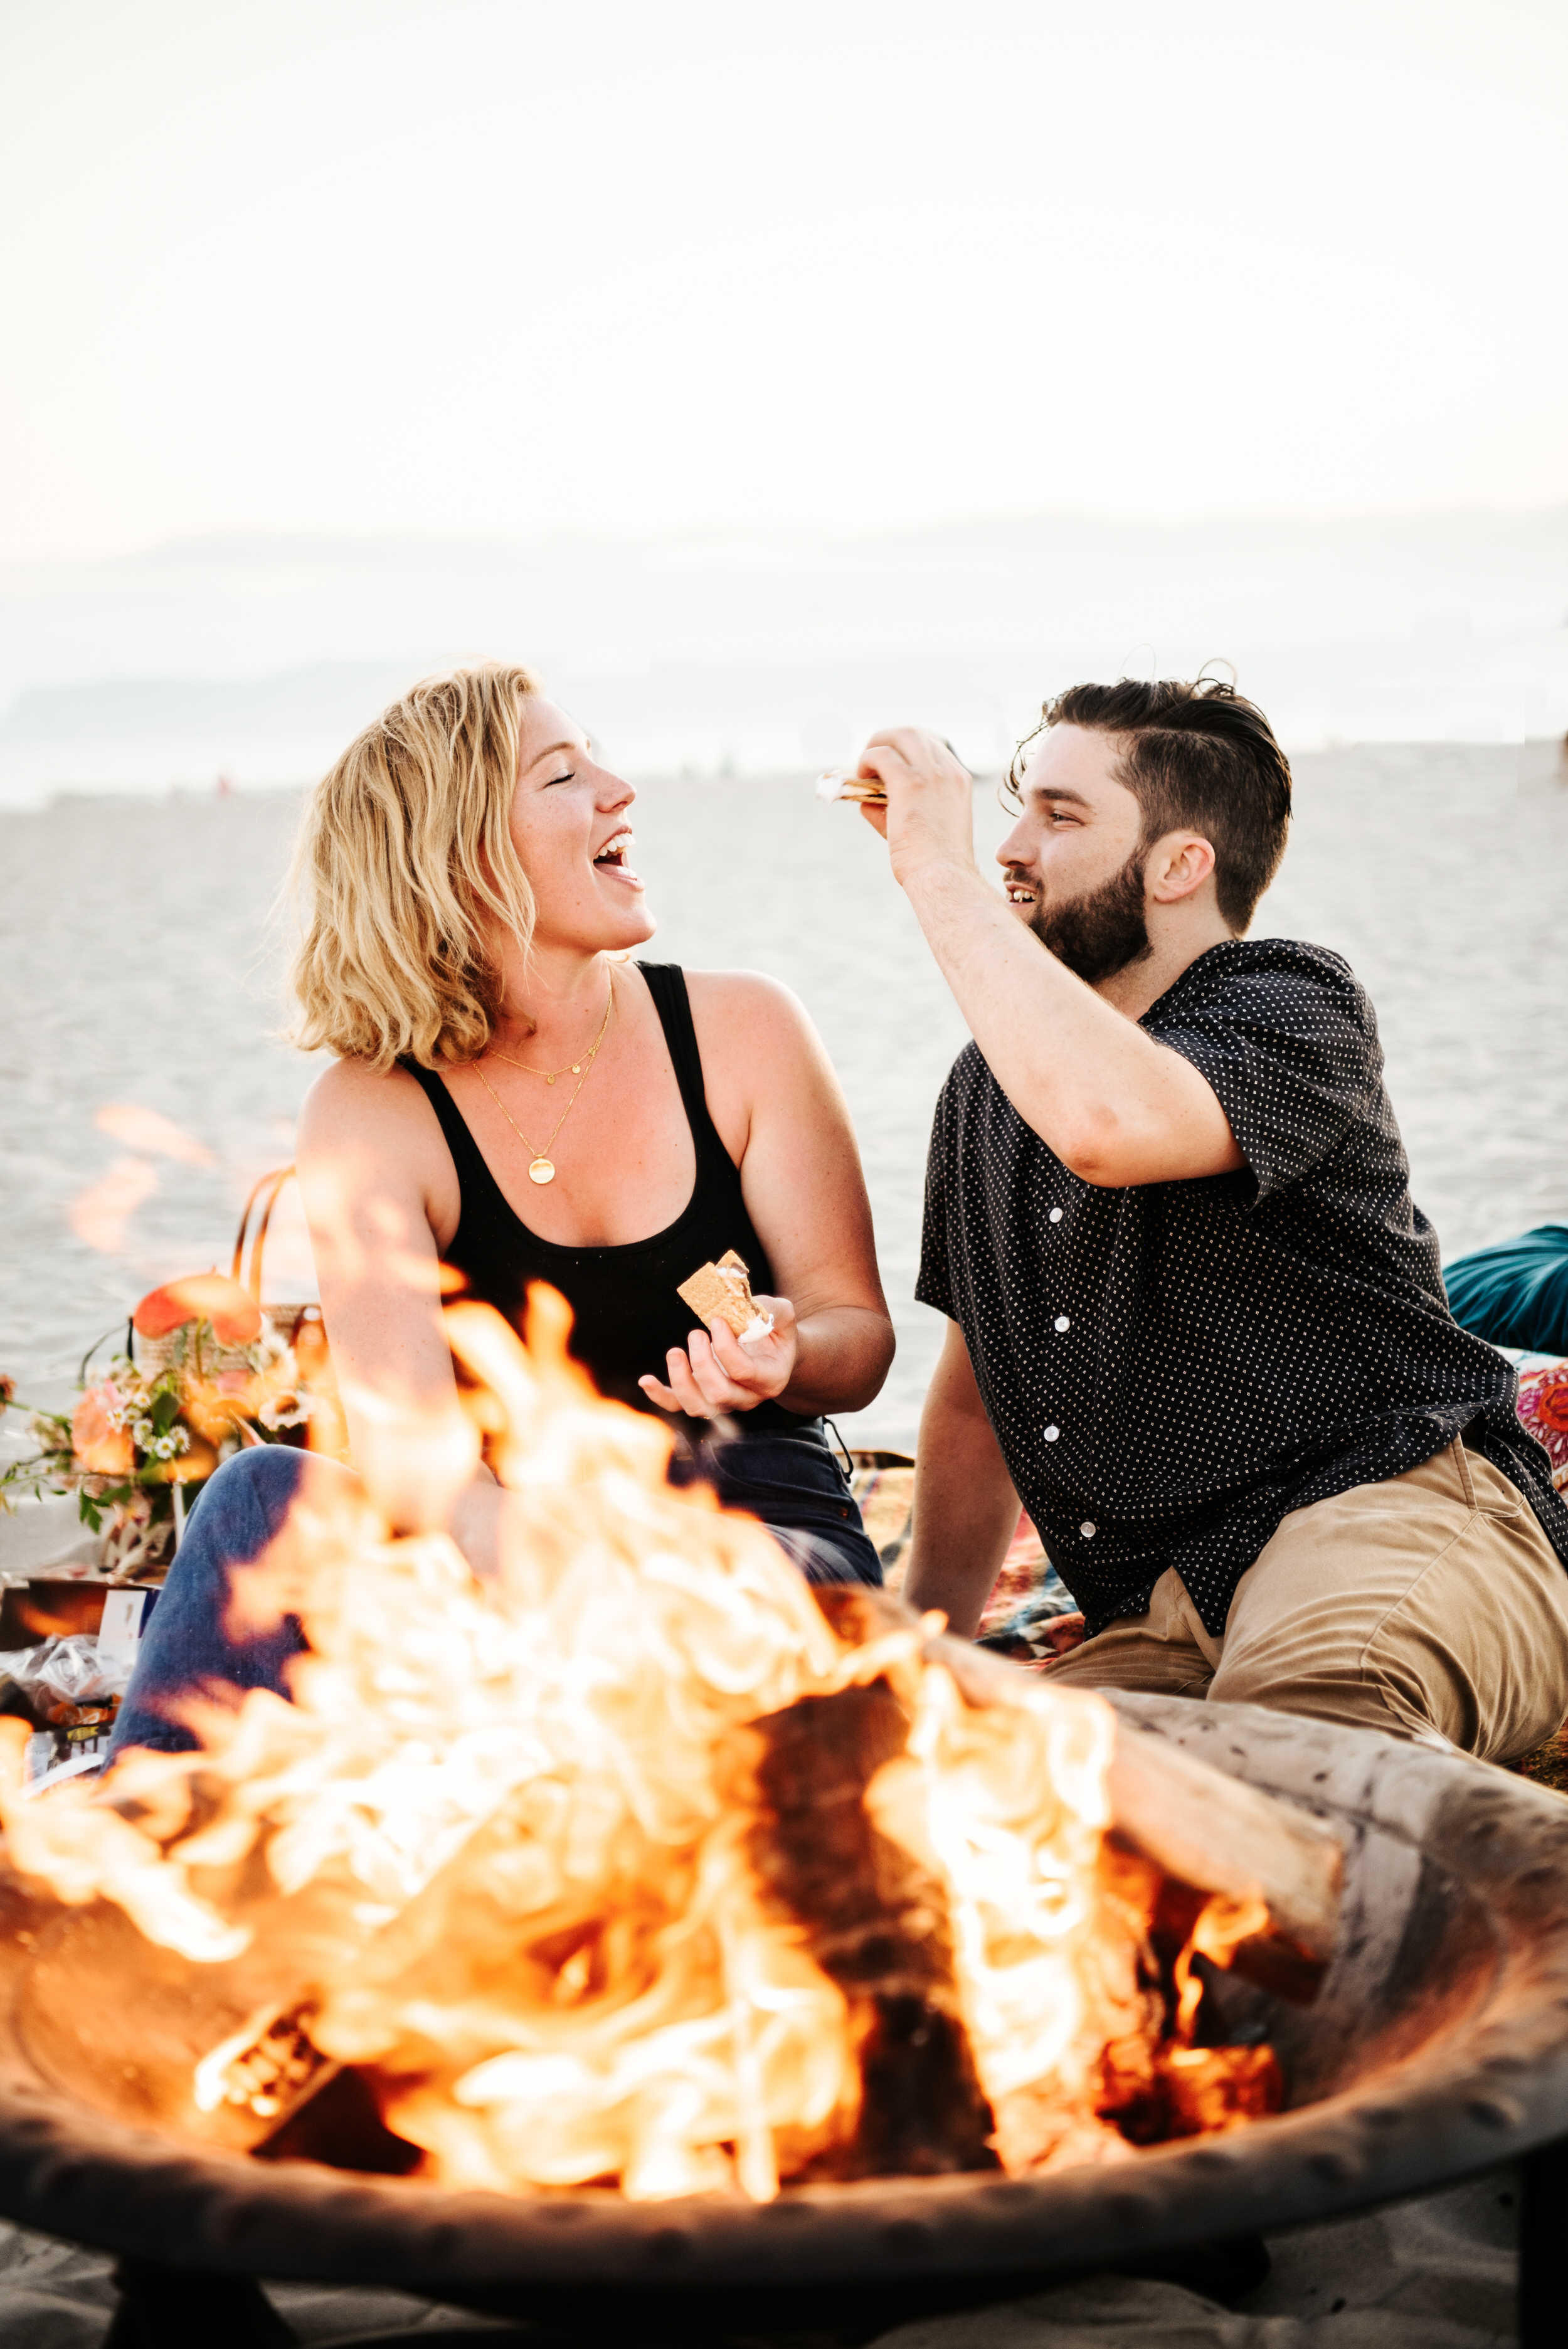 SoCal Standard - San Diego Engagement Photographer - Beach Bonfire at the Hotel Del Coronado-36.jpg